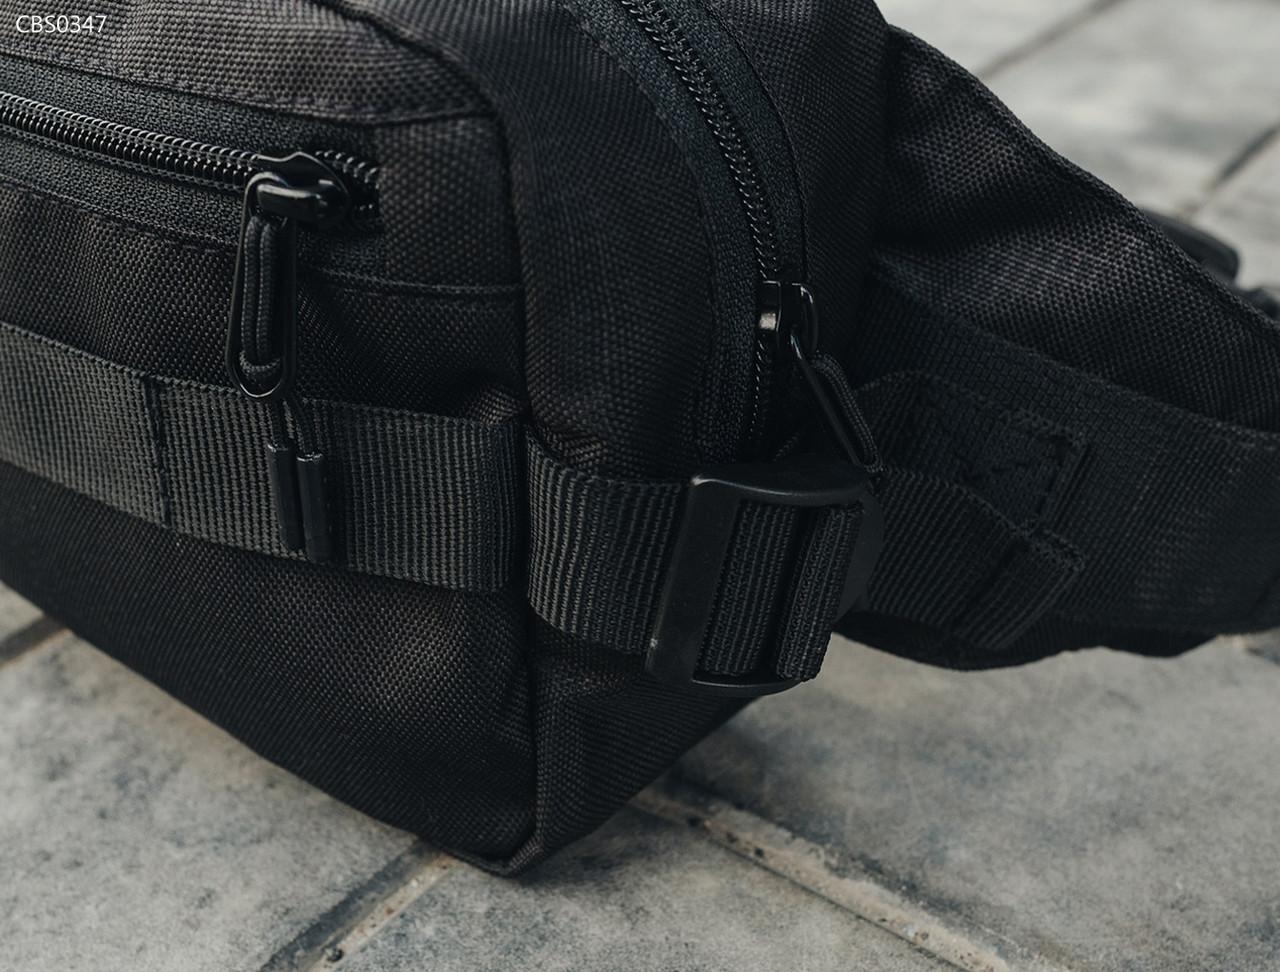 Поясная сумка Staff square black